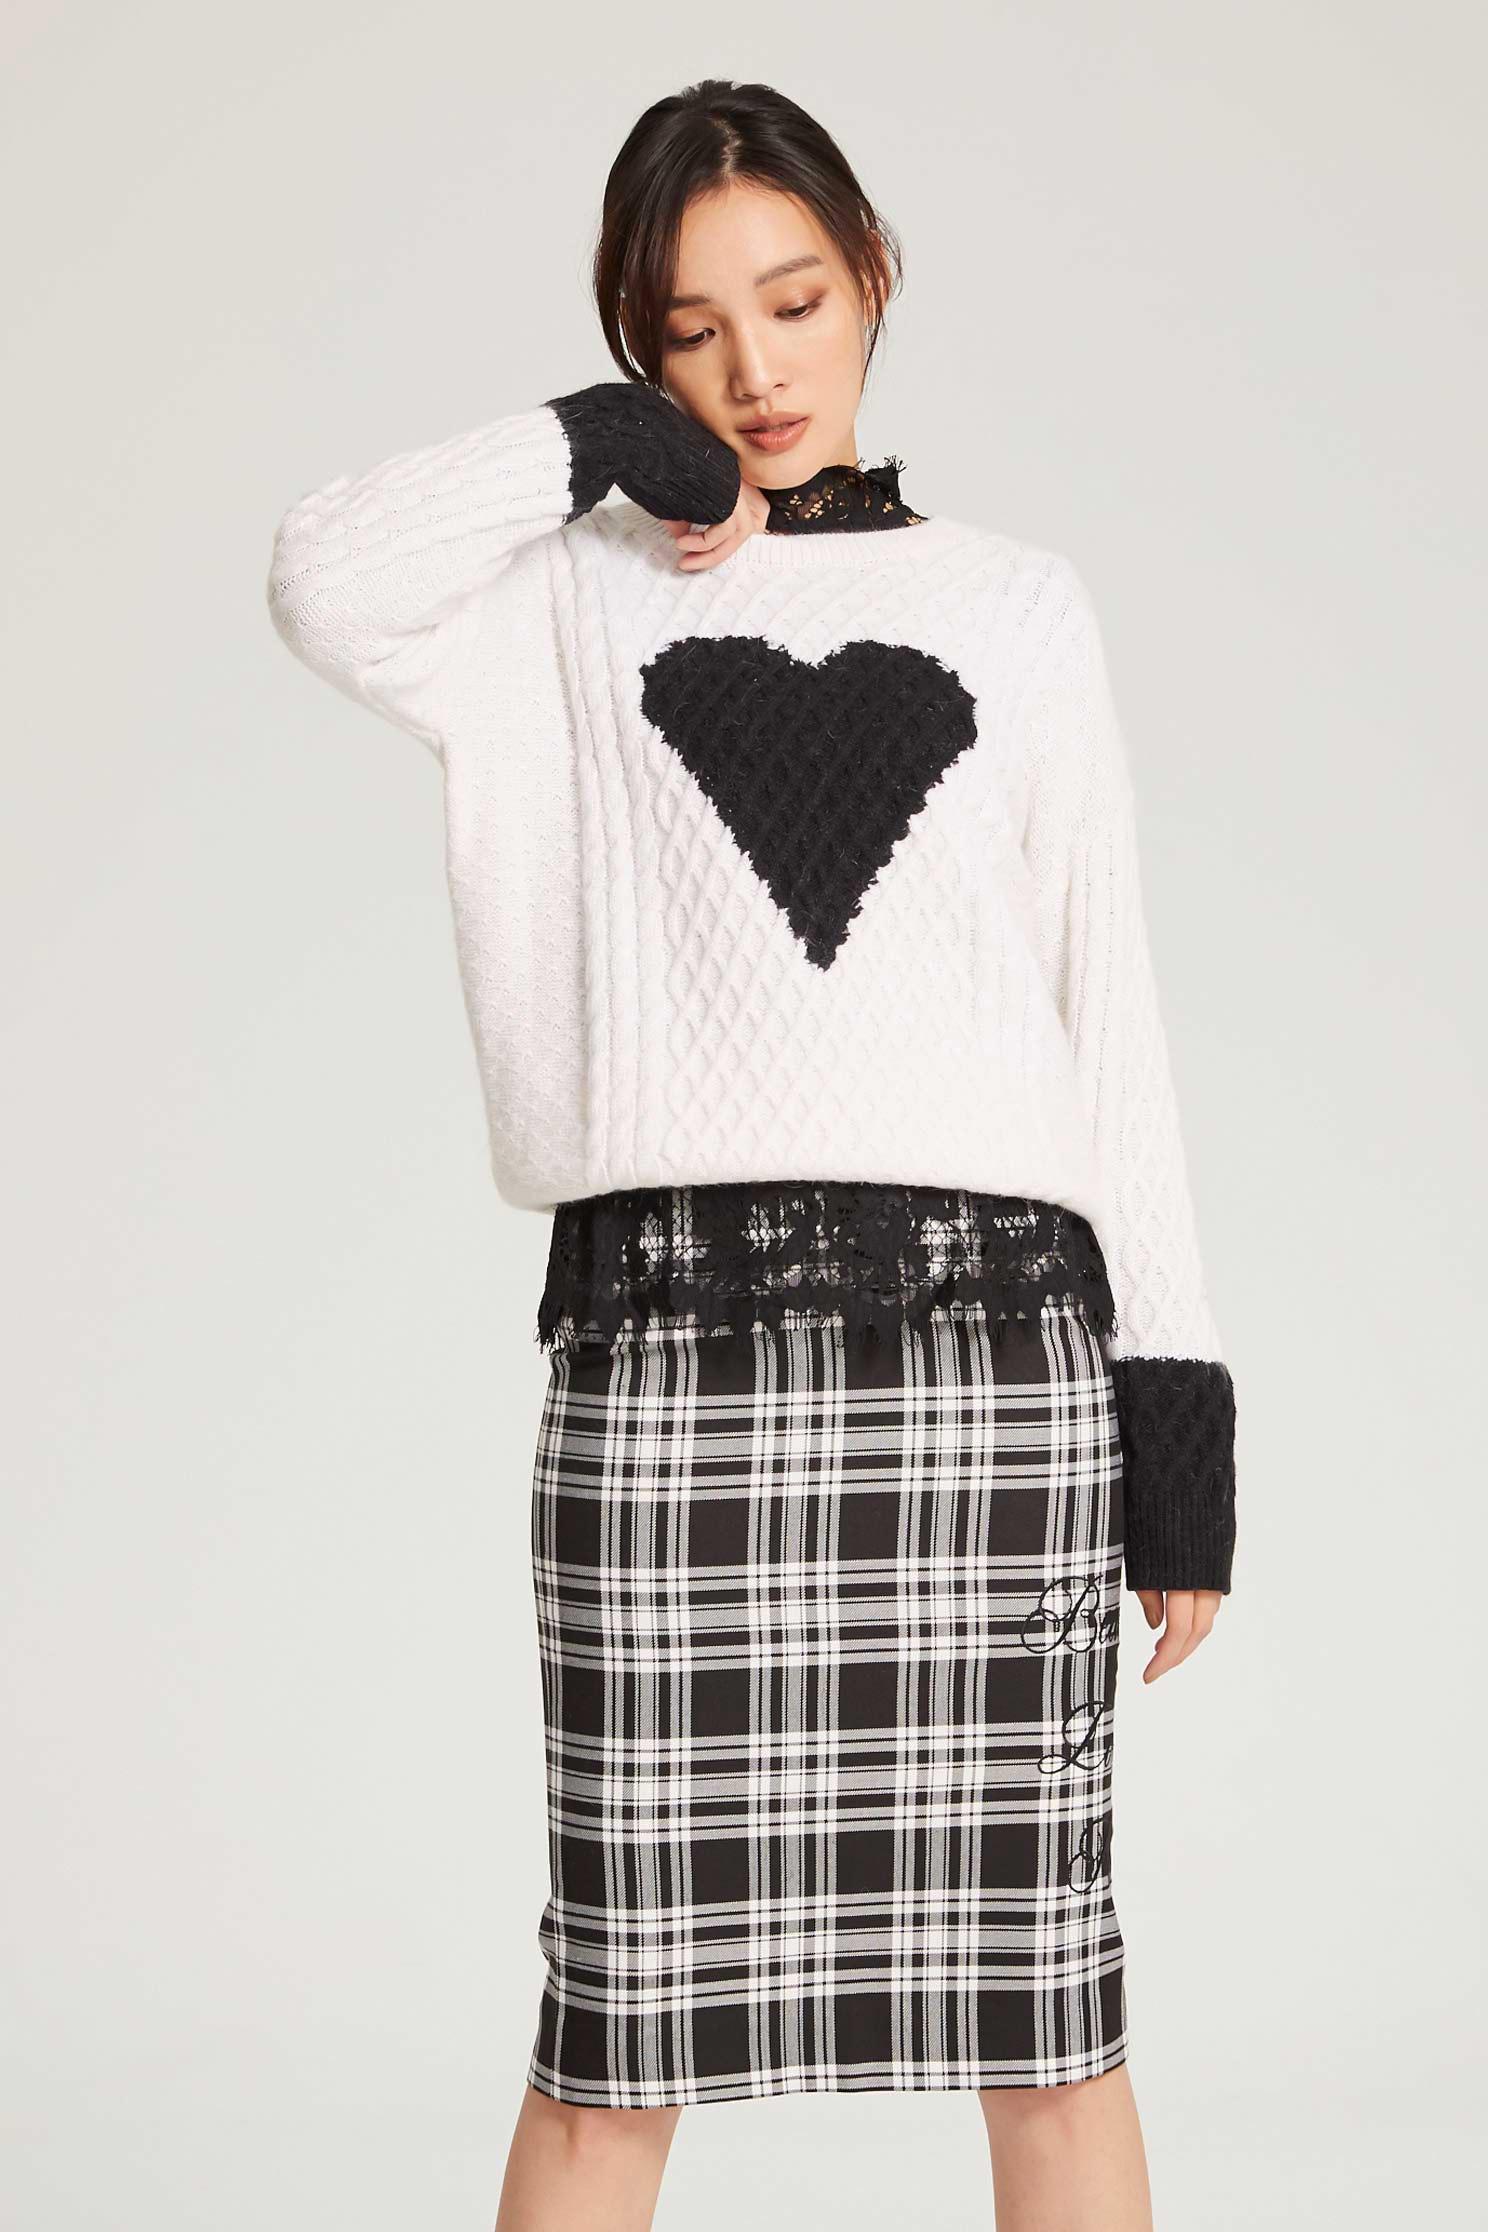 Heart pattern classic top